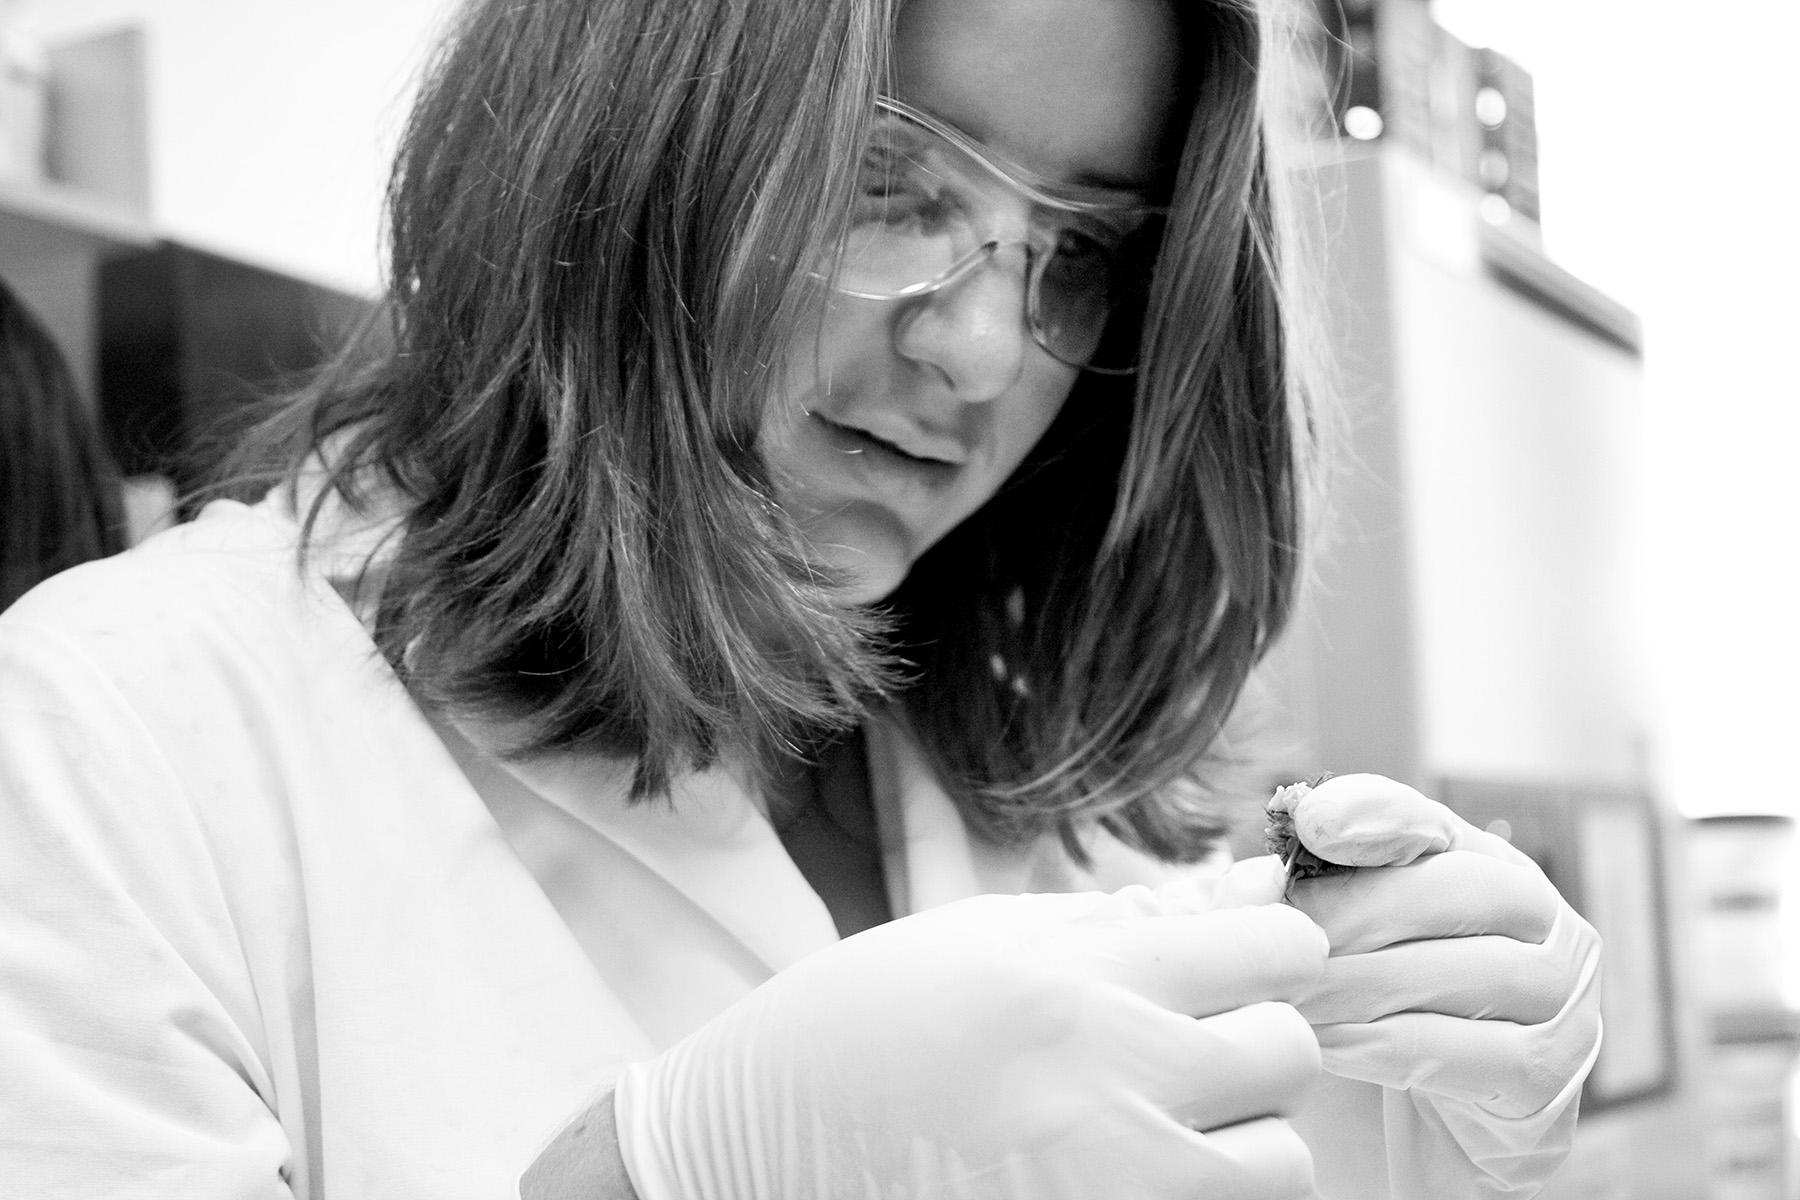 Vanessa harvests brain tissue from the specimen.